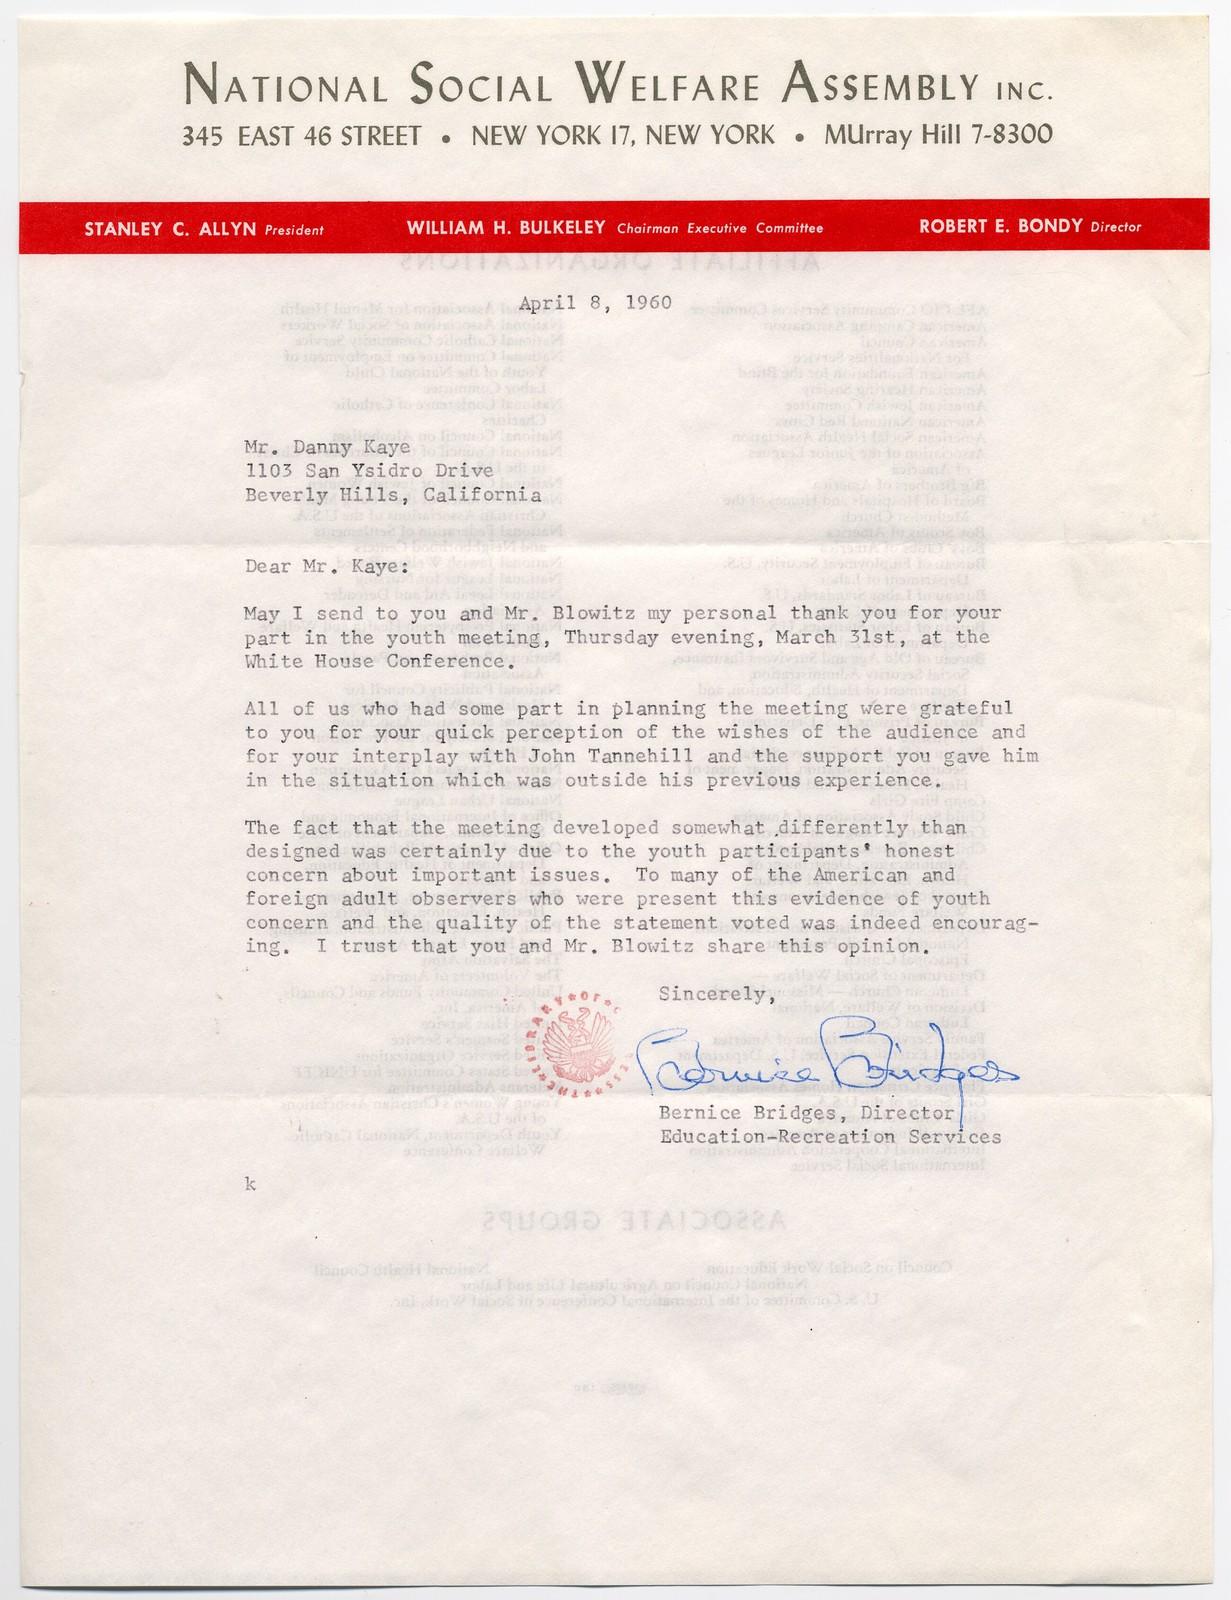 Bernice Bridges [of the National Social Welfare Assembly] to Danny Kaye, April 8, 1960